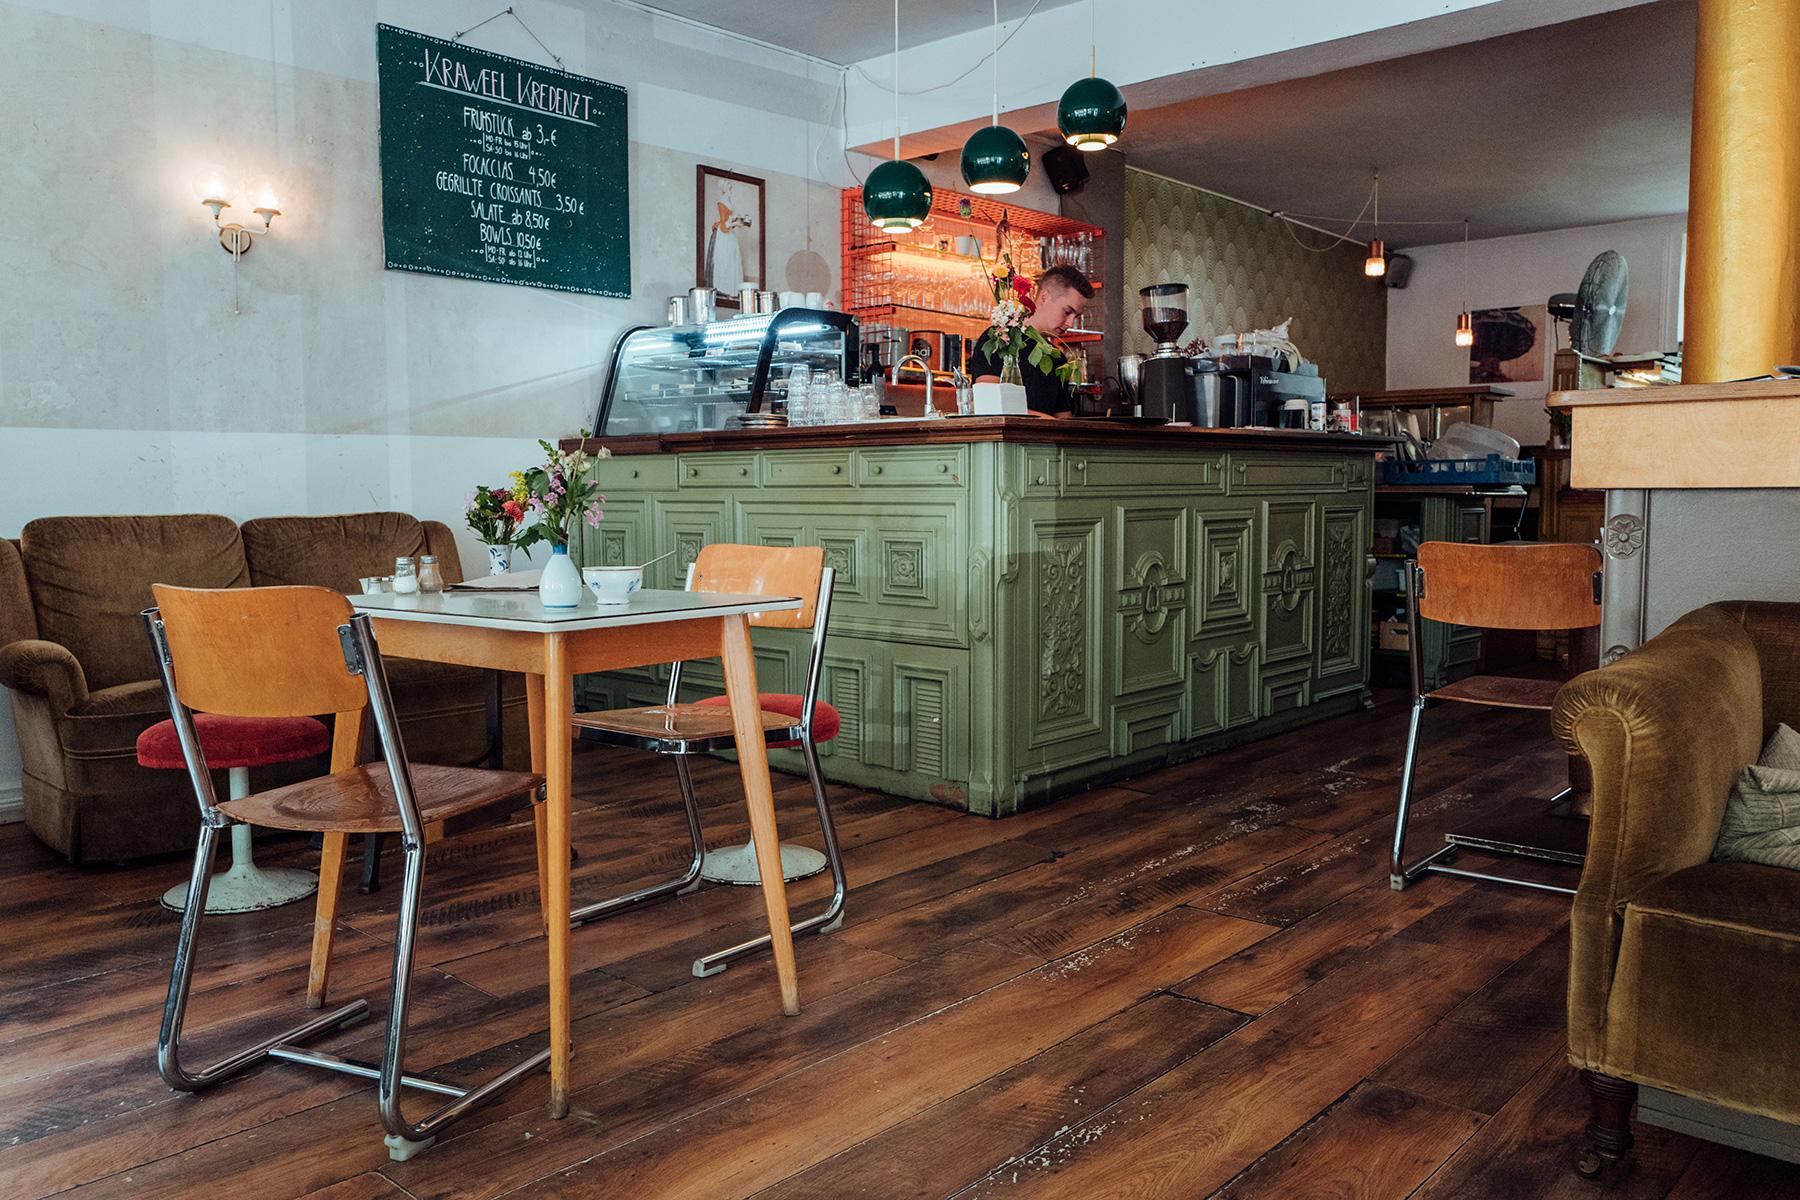 Kraweel StPauli cafe geheimtipp hamburg lisa knauer 07